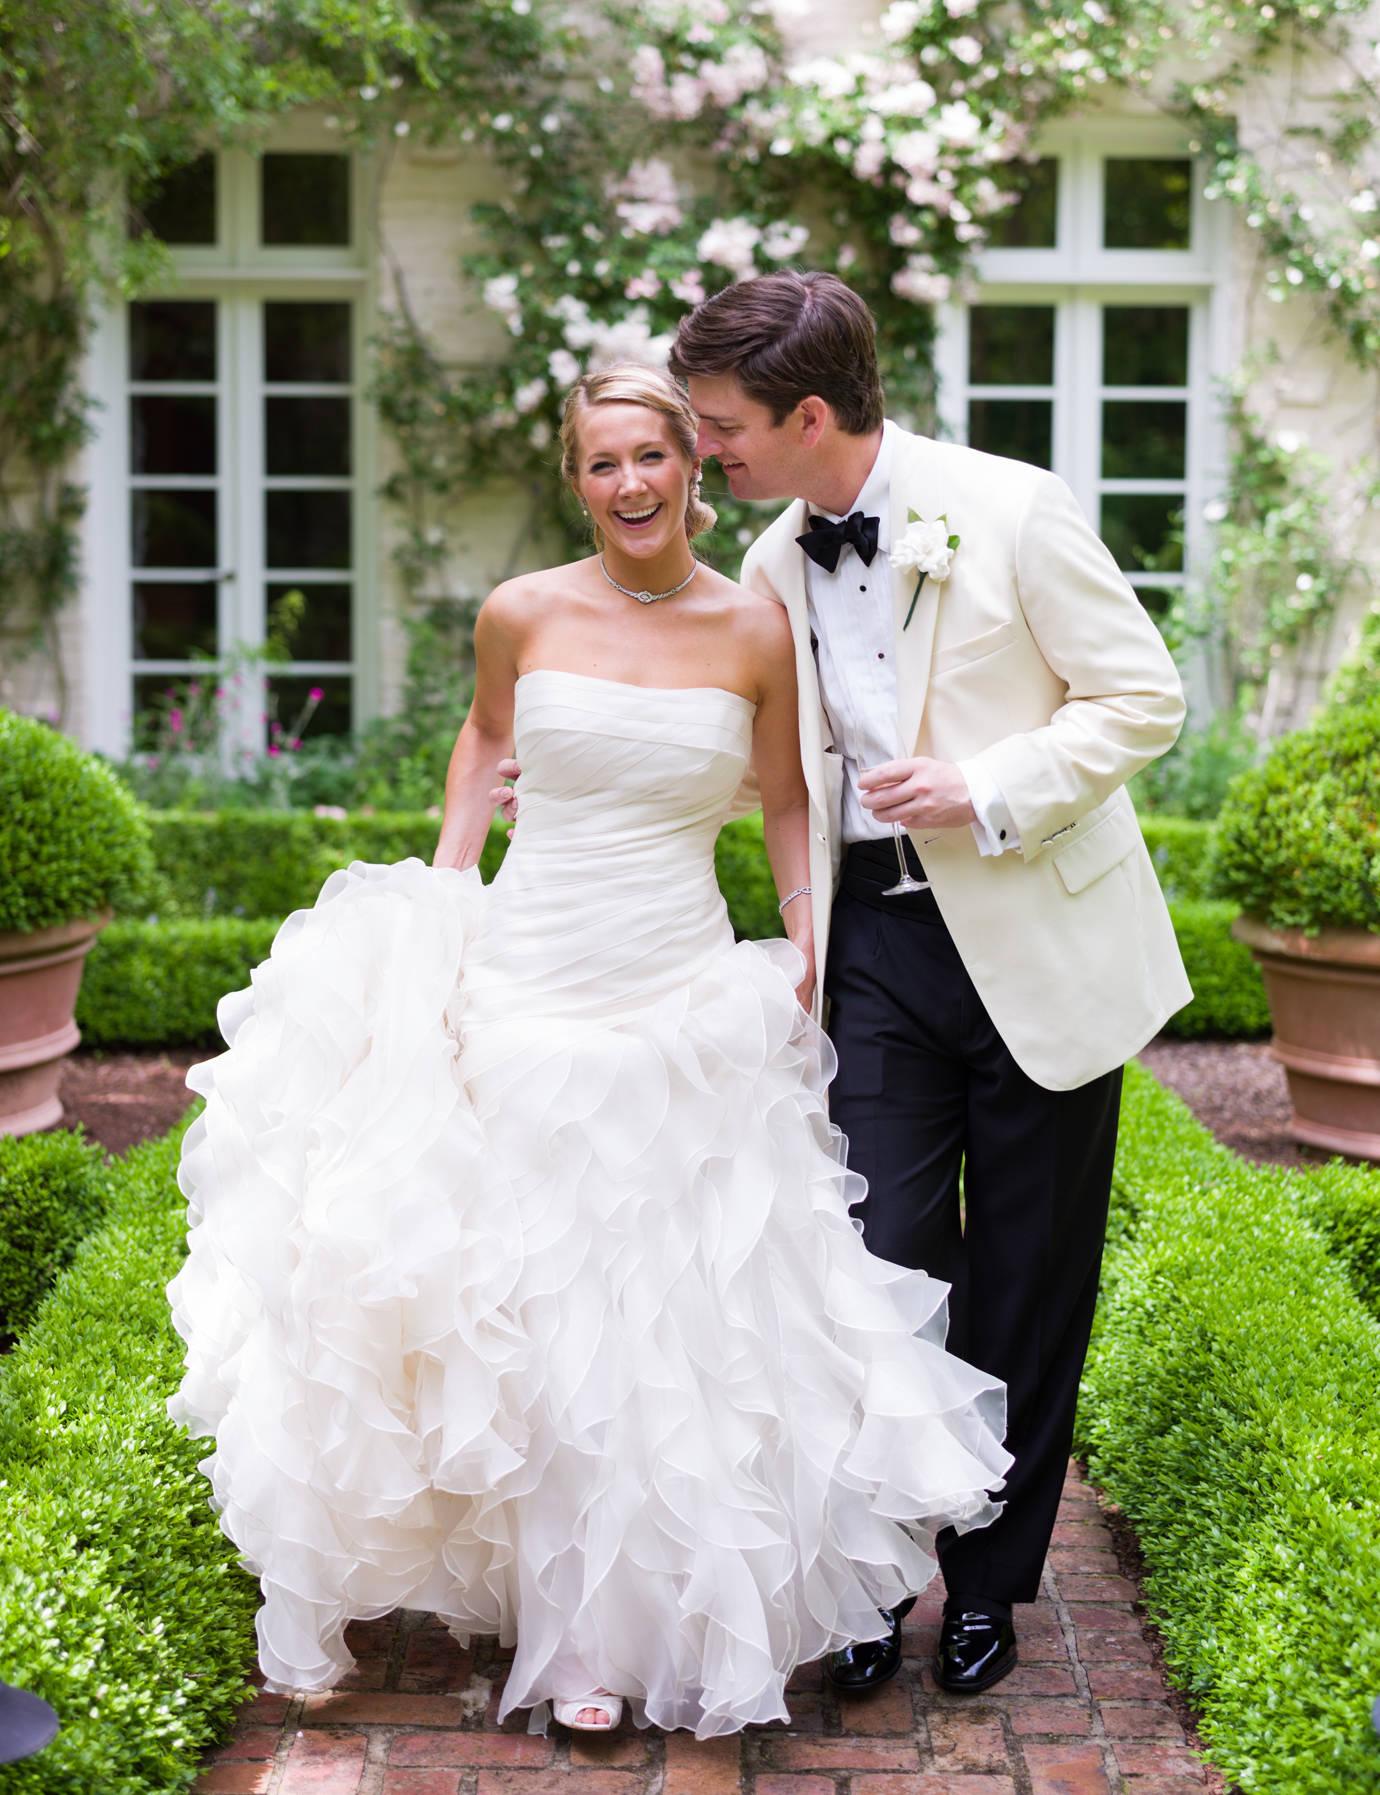 Southern Weddings - Nashville Weddings